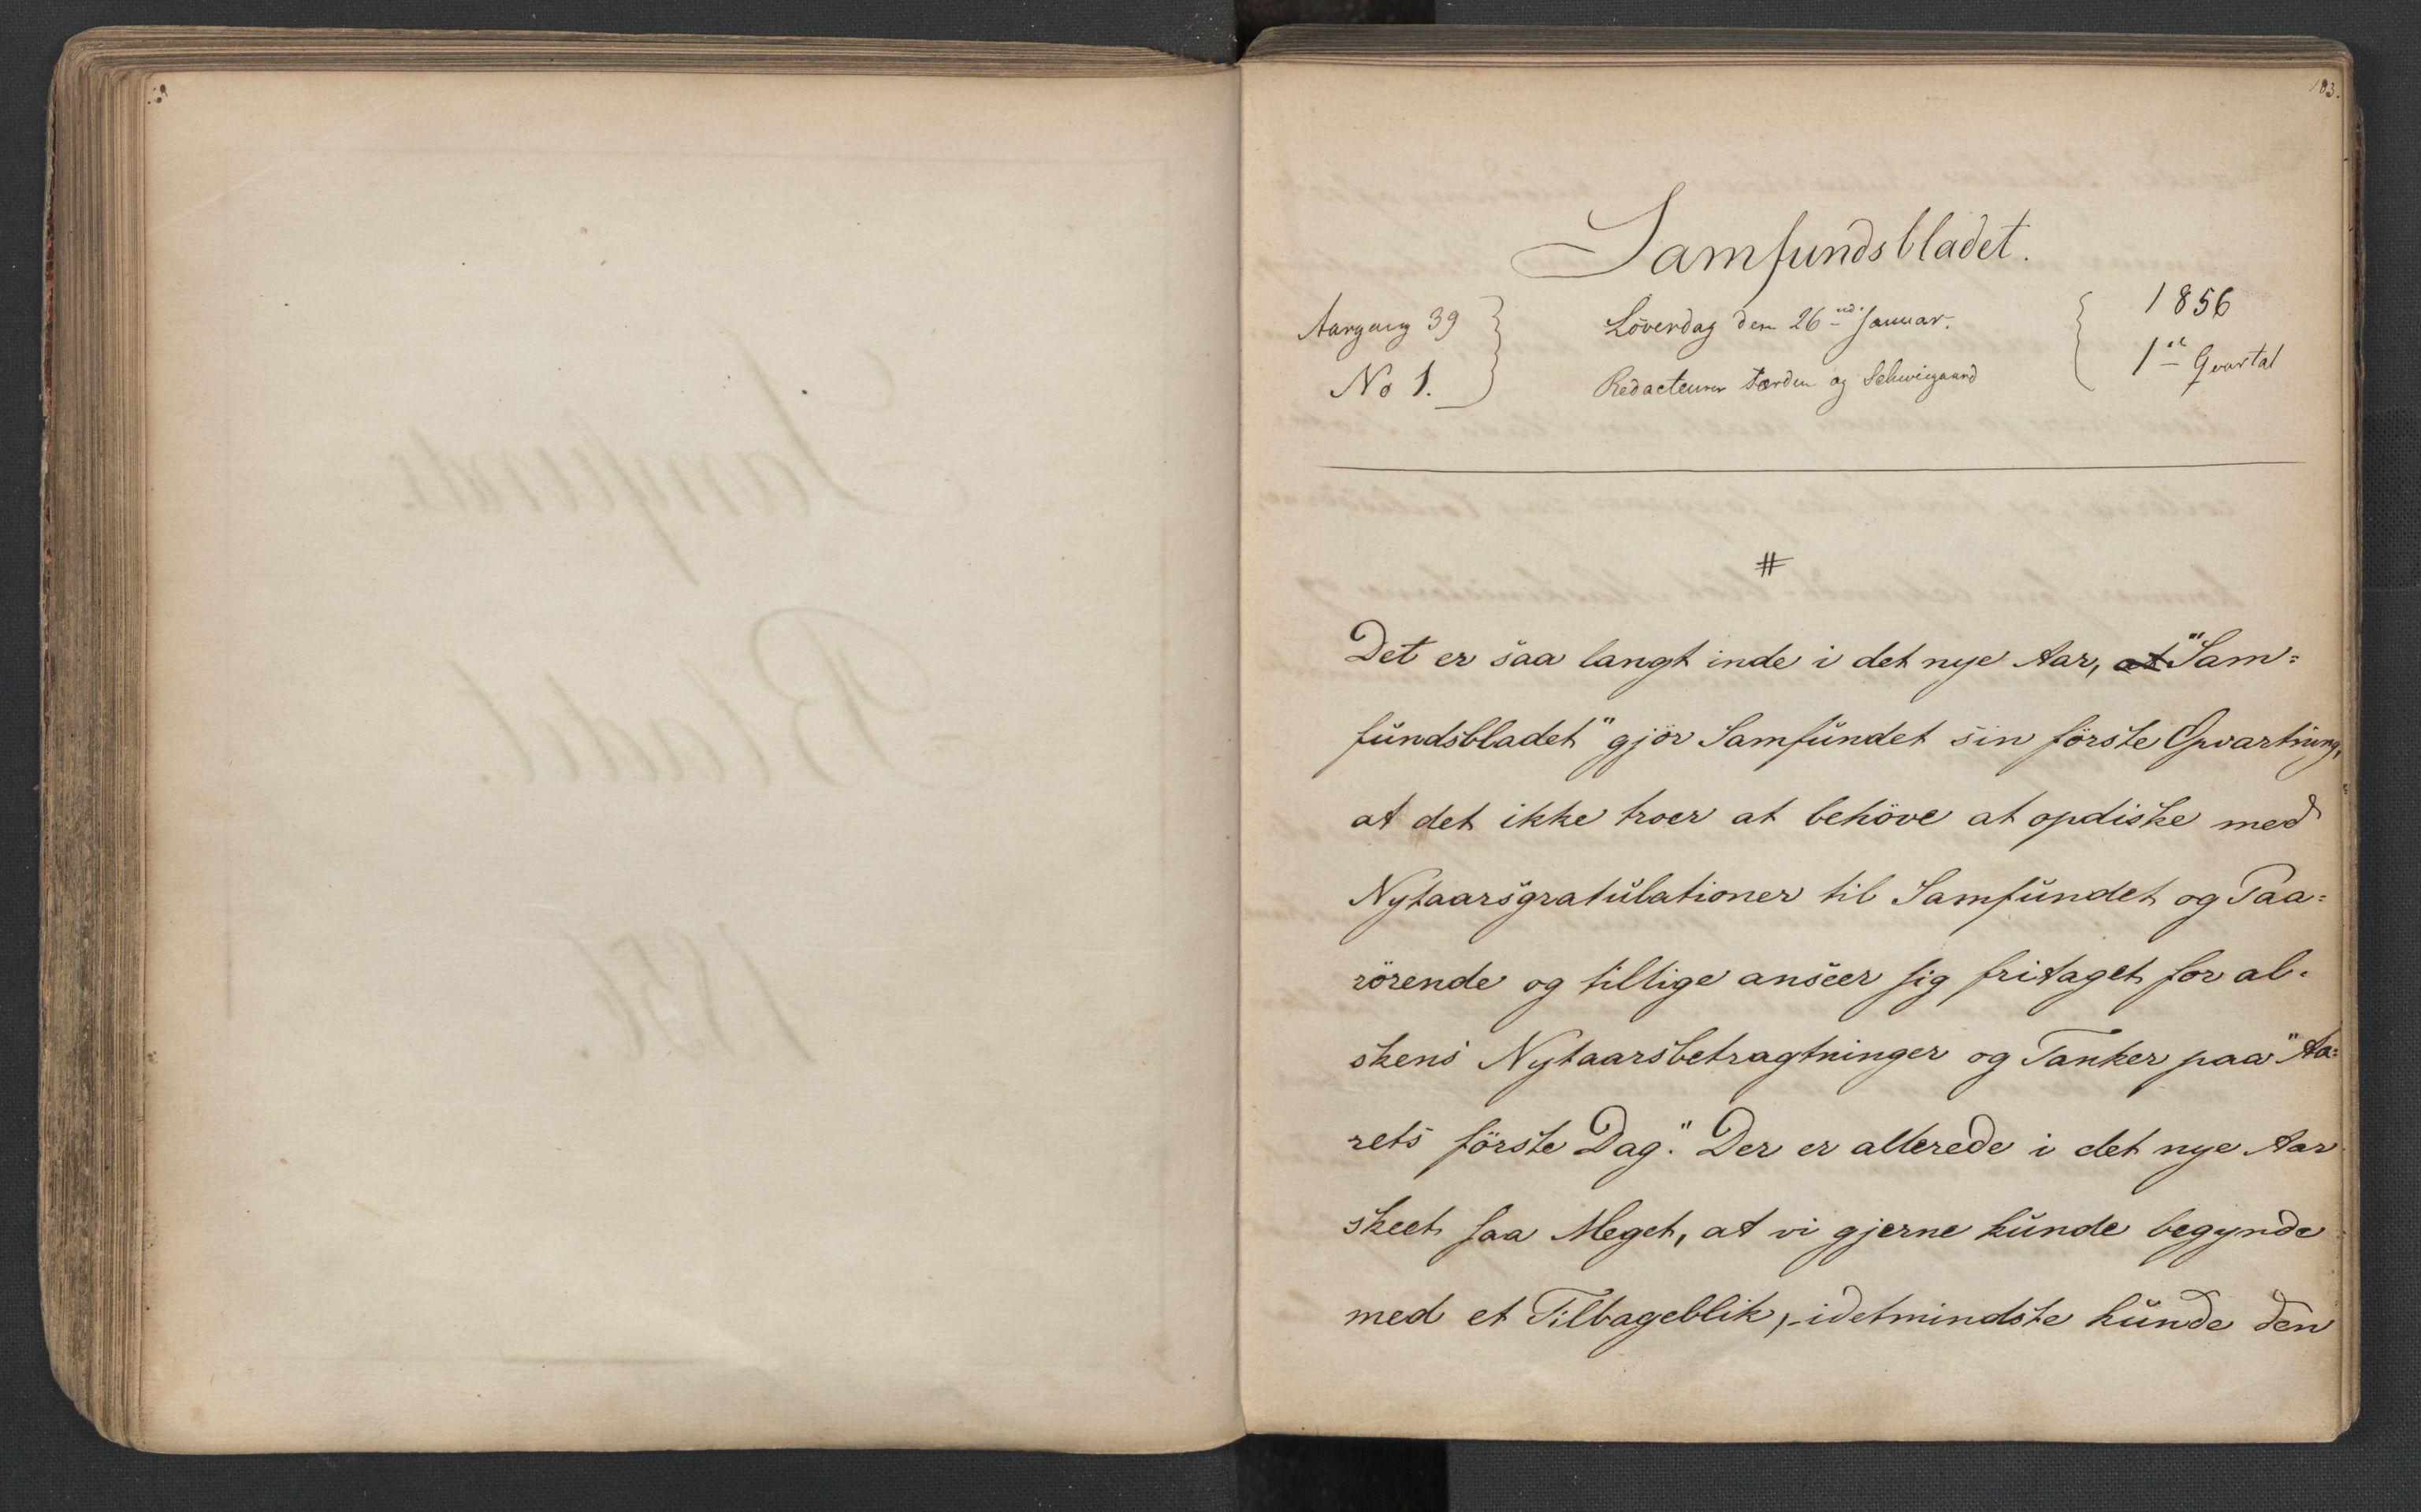 RA, Det Norske Studentersamfund, X/Xa/L0005, 1855-1856, s. 93